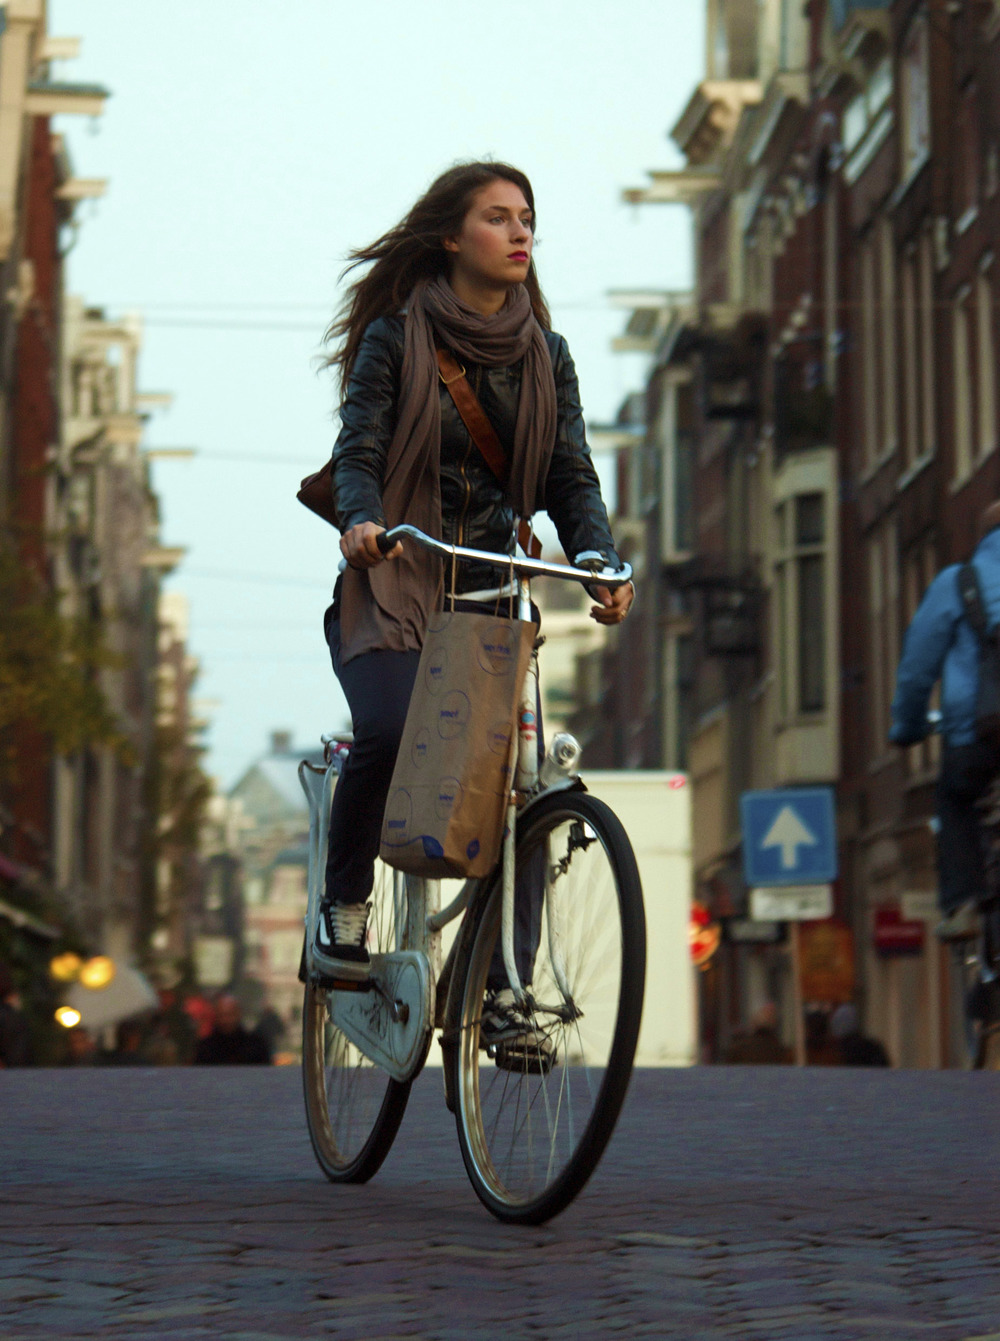 CC BY-NC-SA 2.0 Amsterdamized